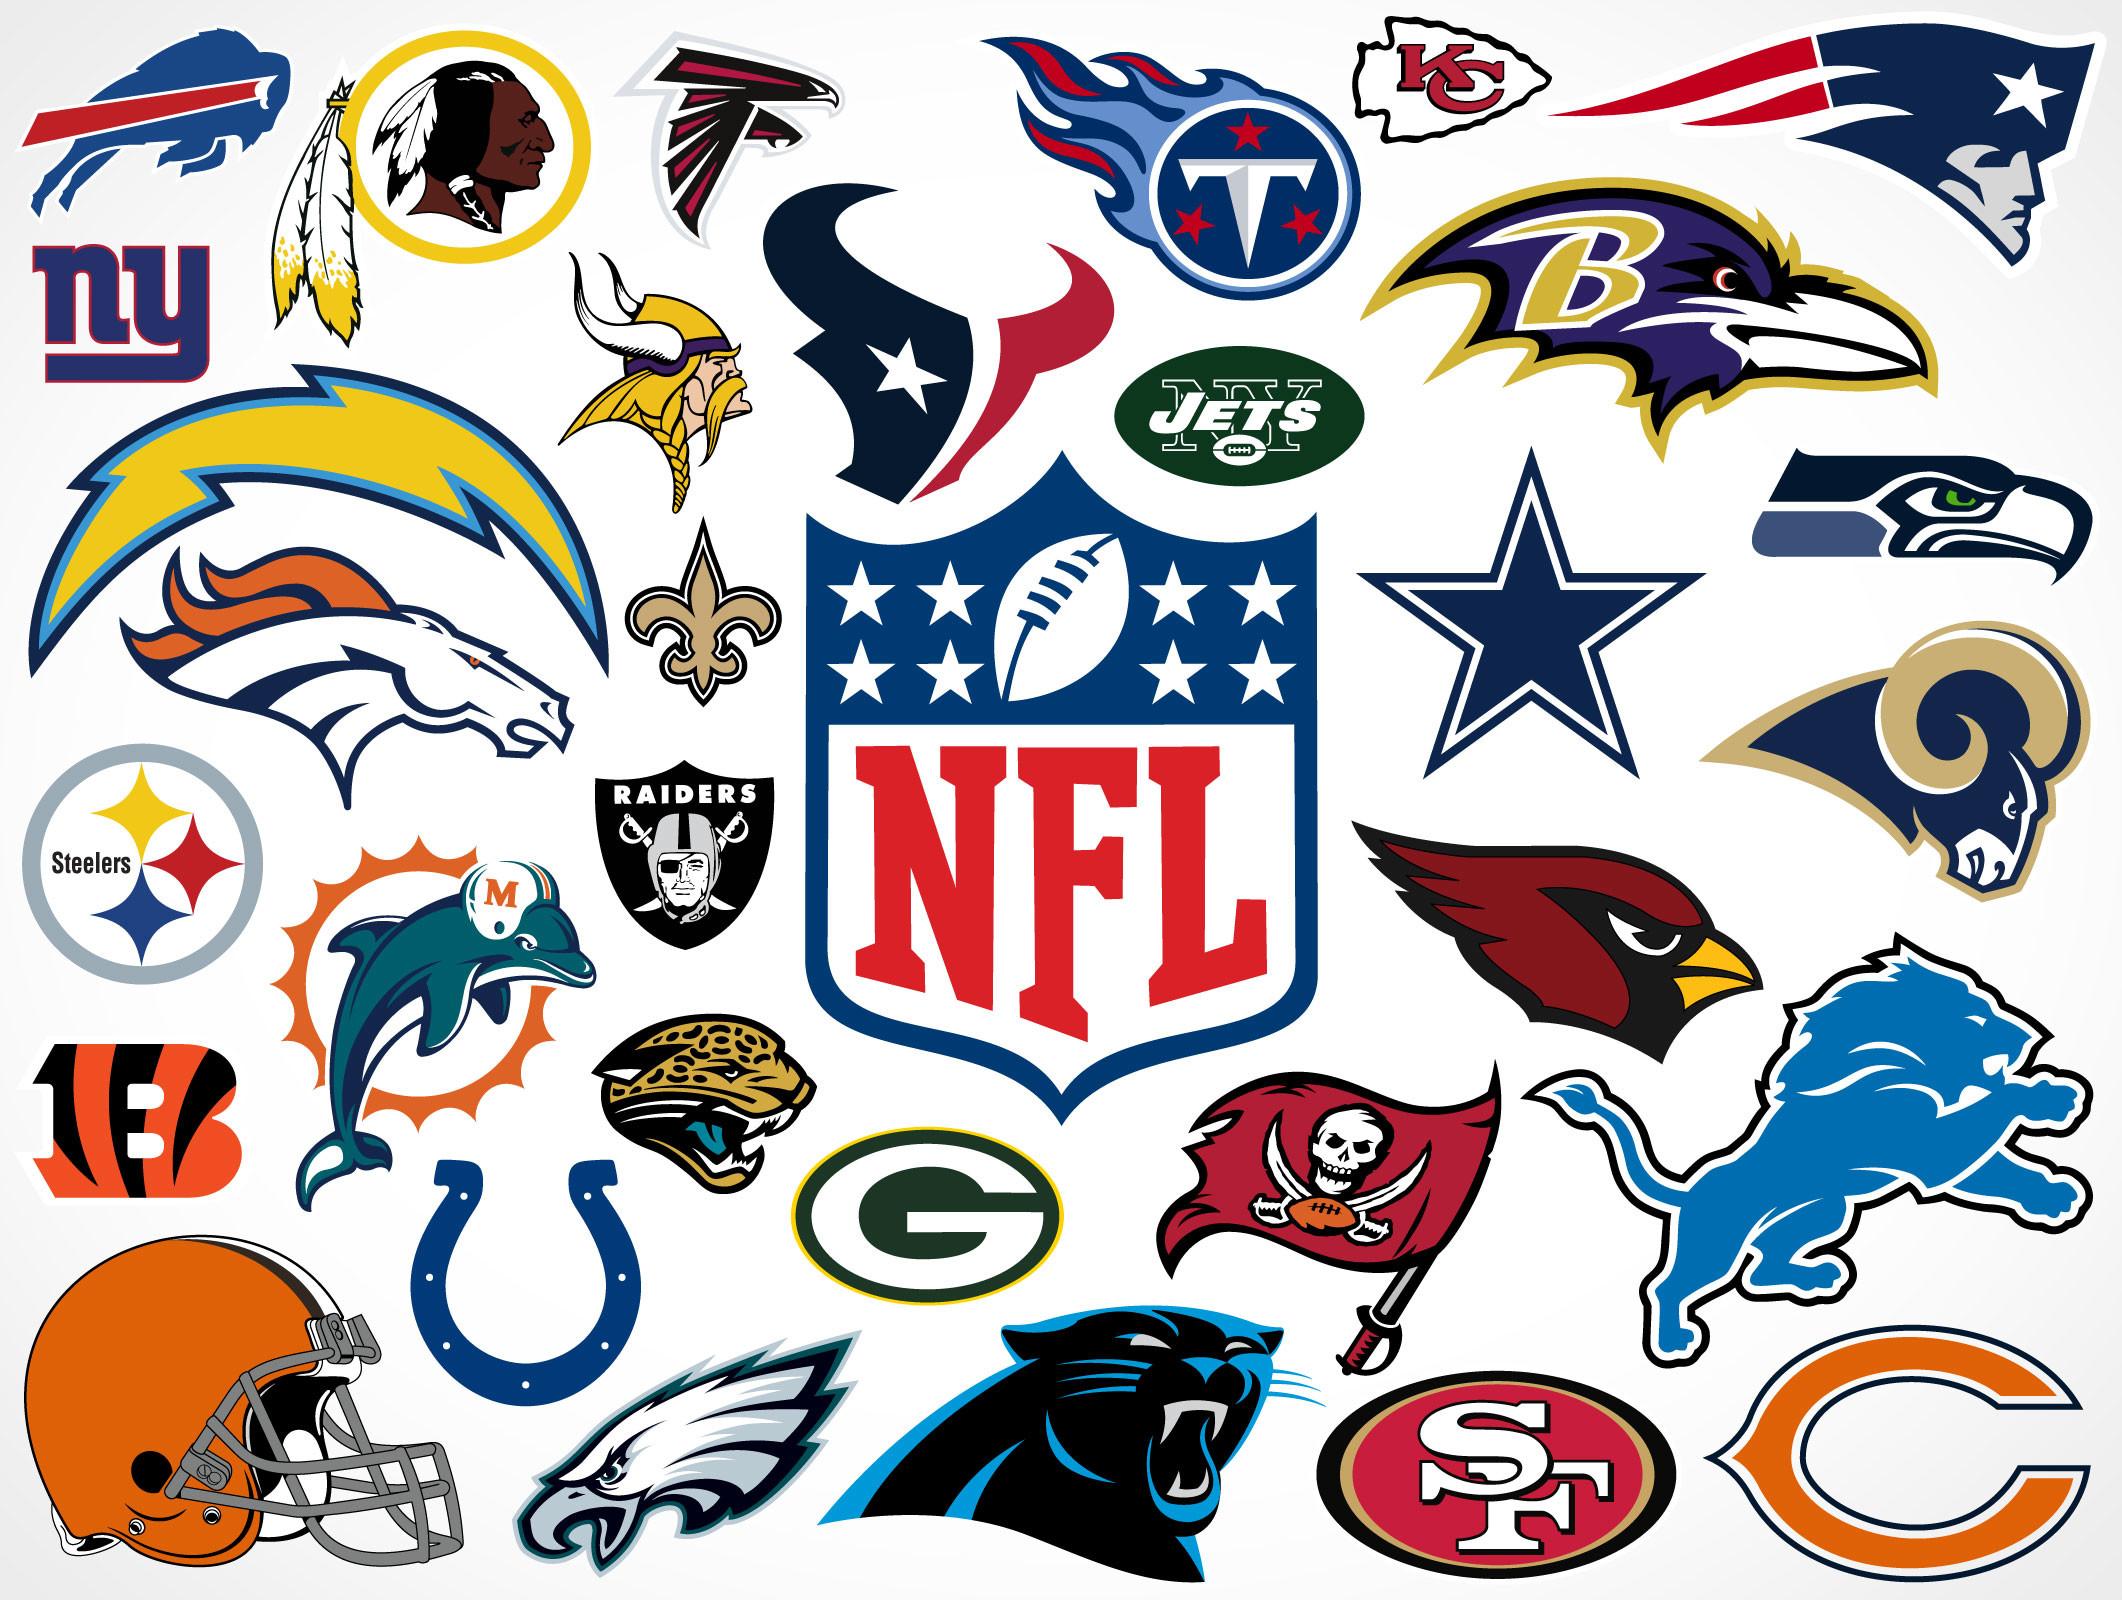 … Great Football Logos Nfl Wallpaper HD 1080p Free Download For Laptop 4K  Mobile Wallpapers Desktop Wallpaper